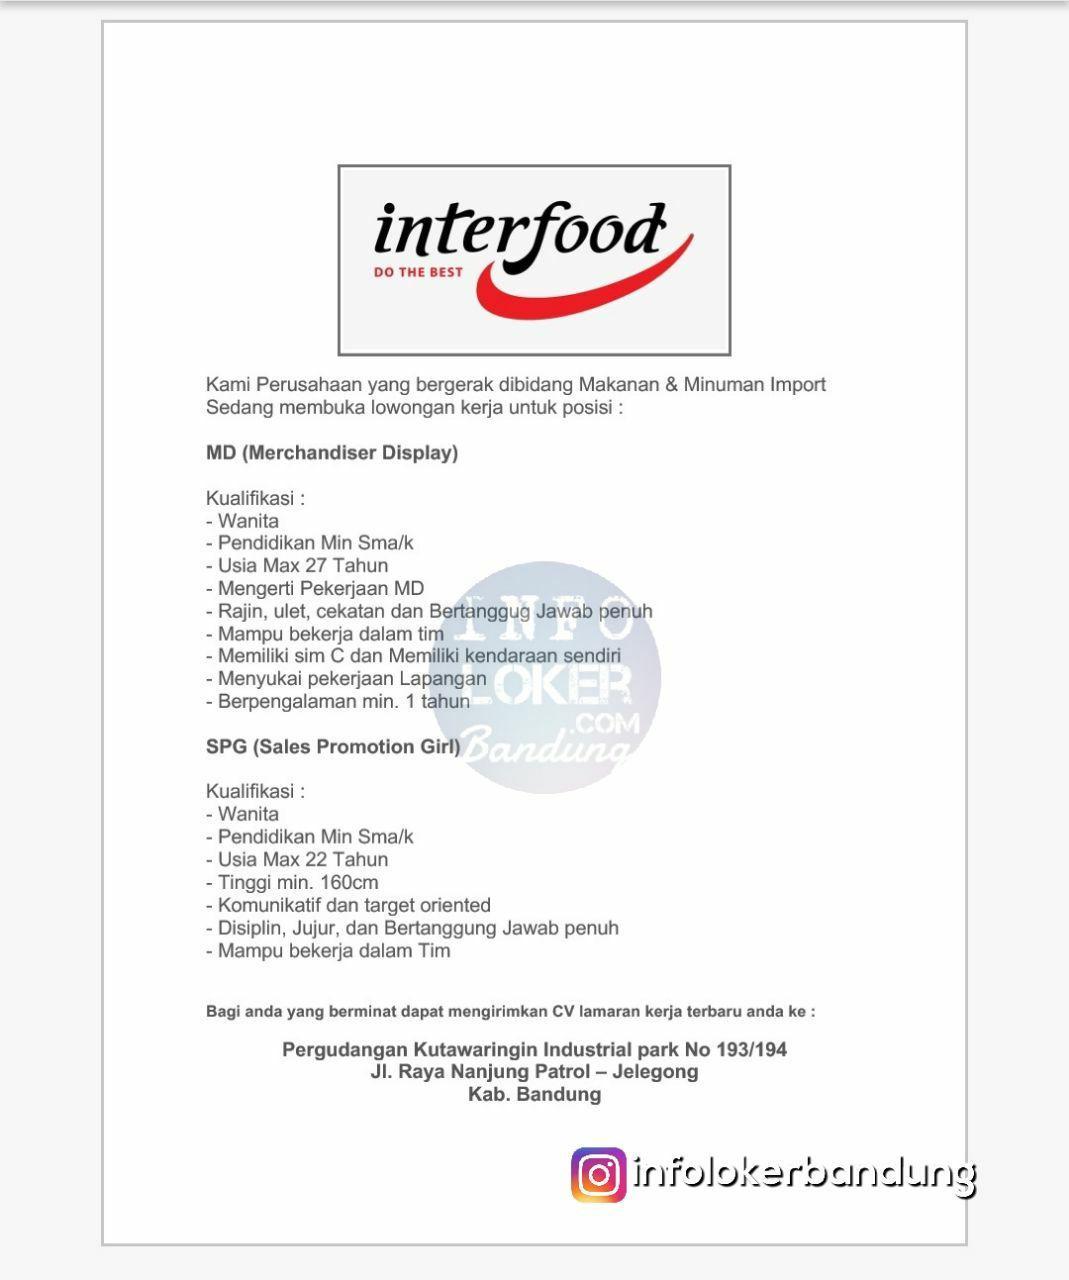 Lowongan Kerja PT. Interfood Sukses Jasindo Bandung Januari 2018